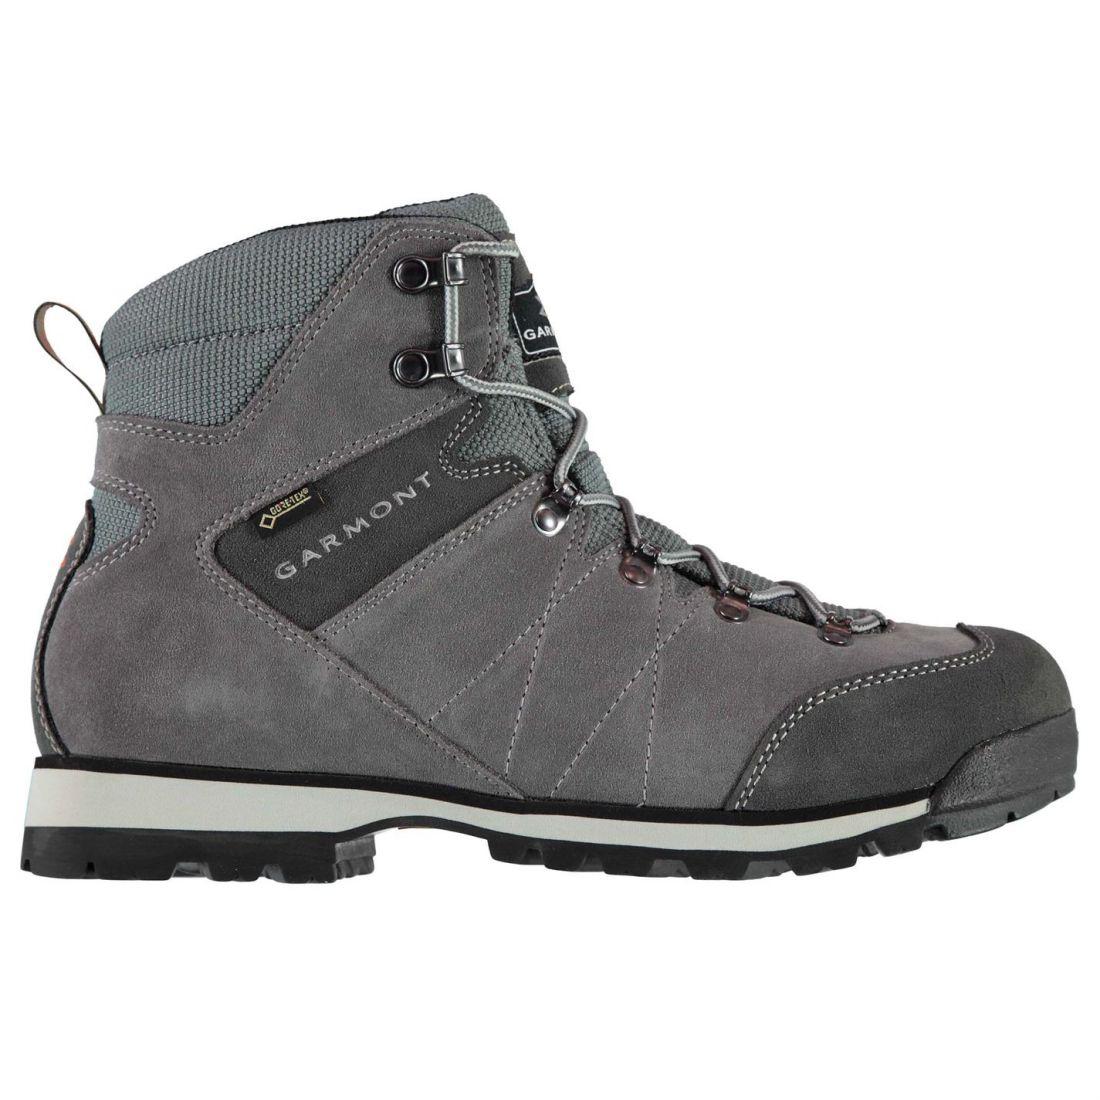 9b4c3591ecd Details about Garmont Mens Sierra GTX Walking Boots Shoes Suede Gore Tex  Lightweight Outdoor